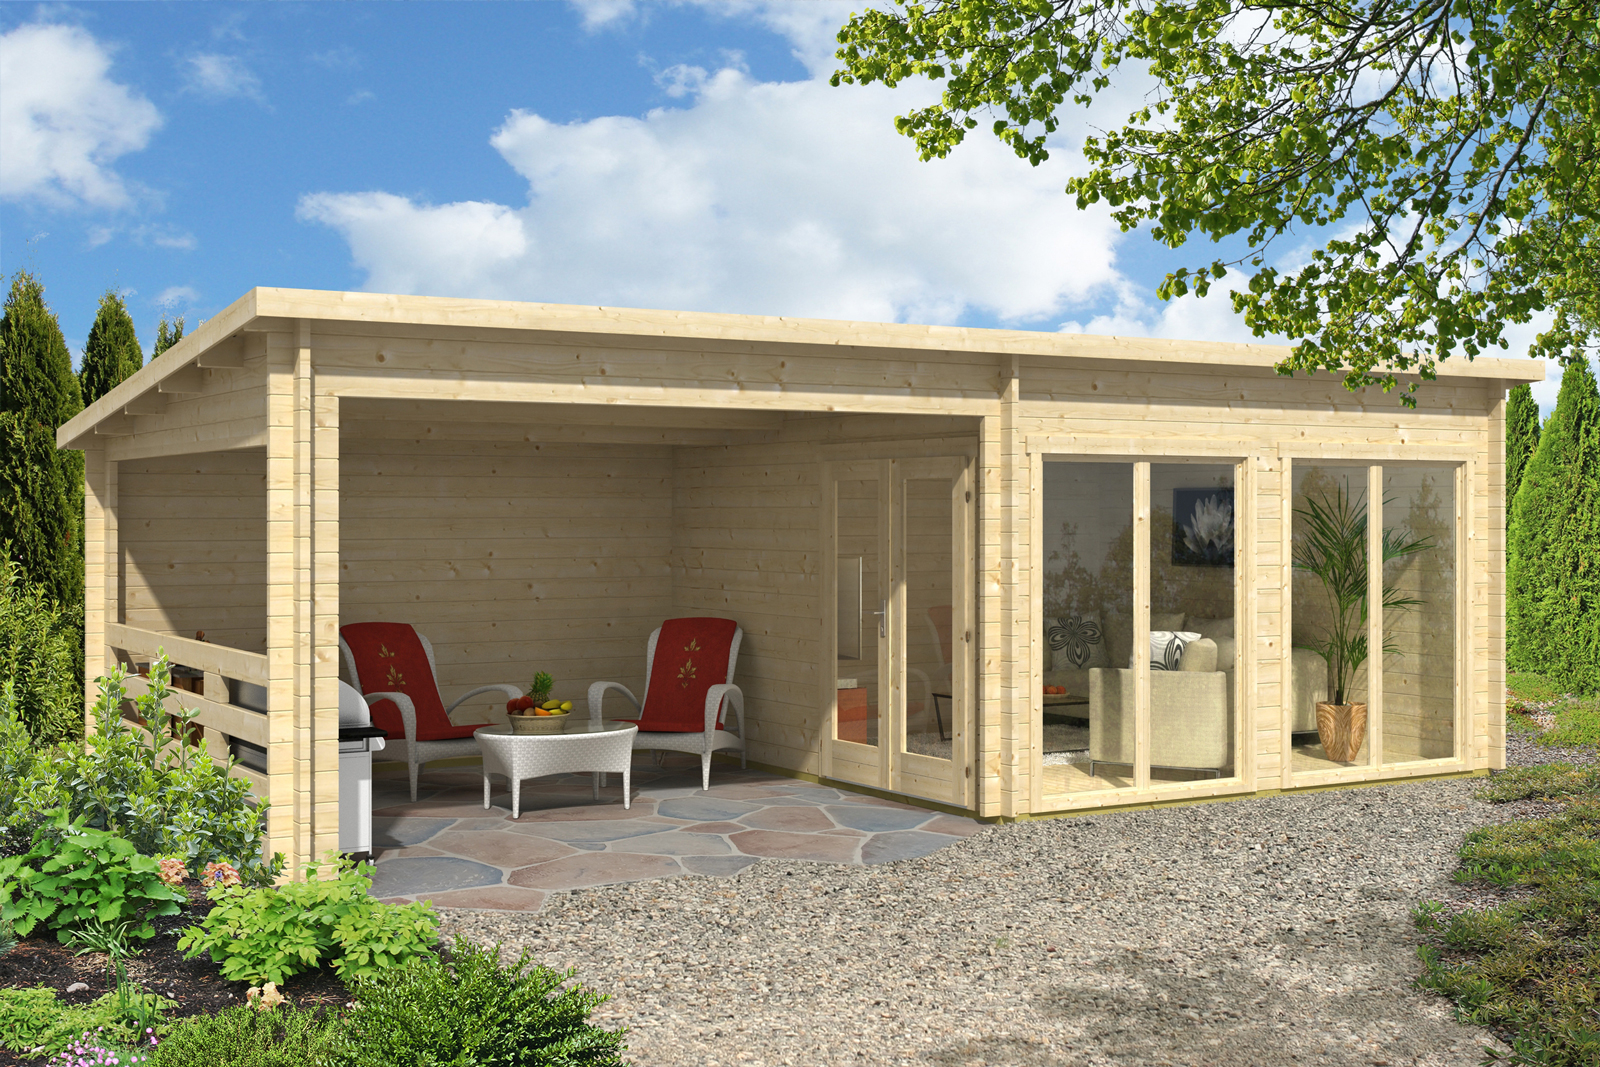 gartenhaus island 70 iso. Black Bedroom Furniture Sets. Home Design Ideas